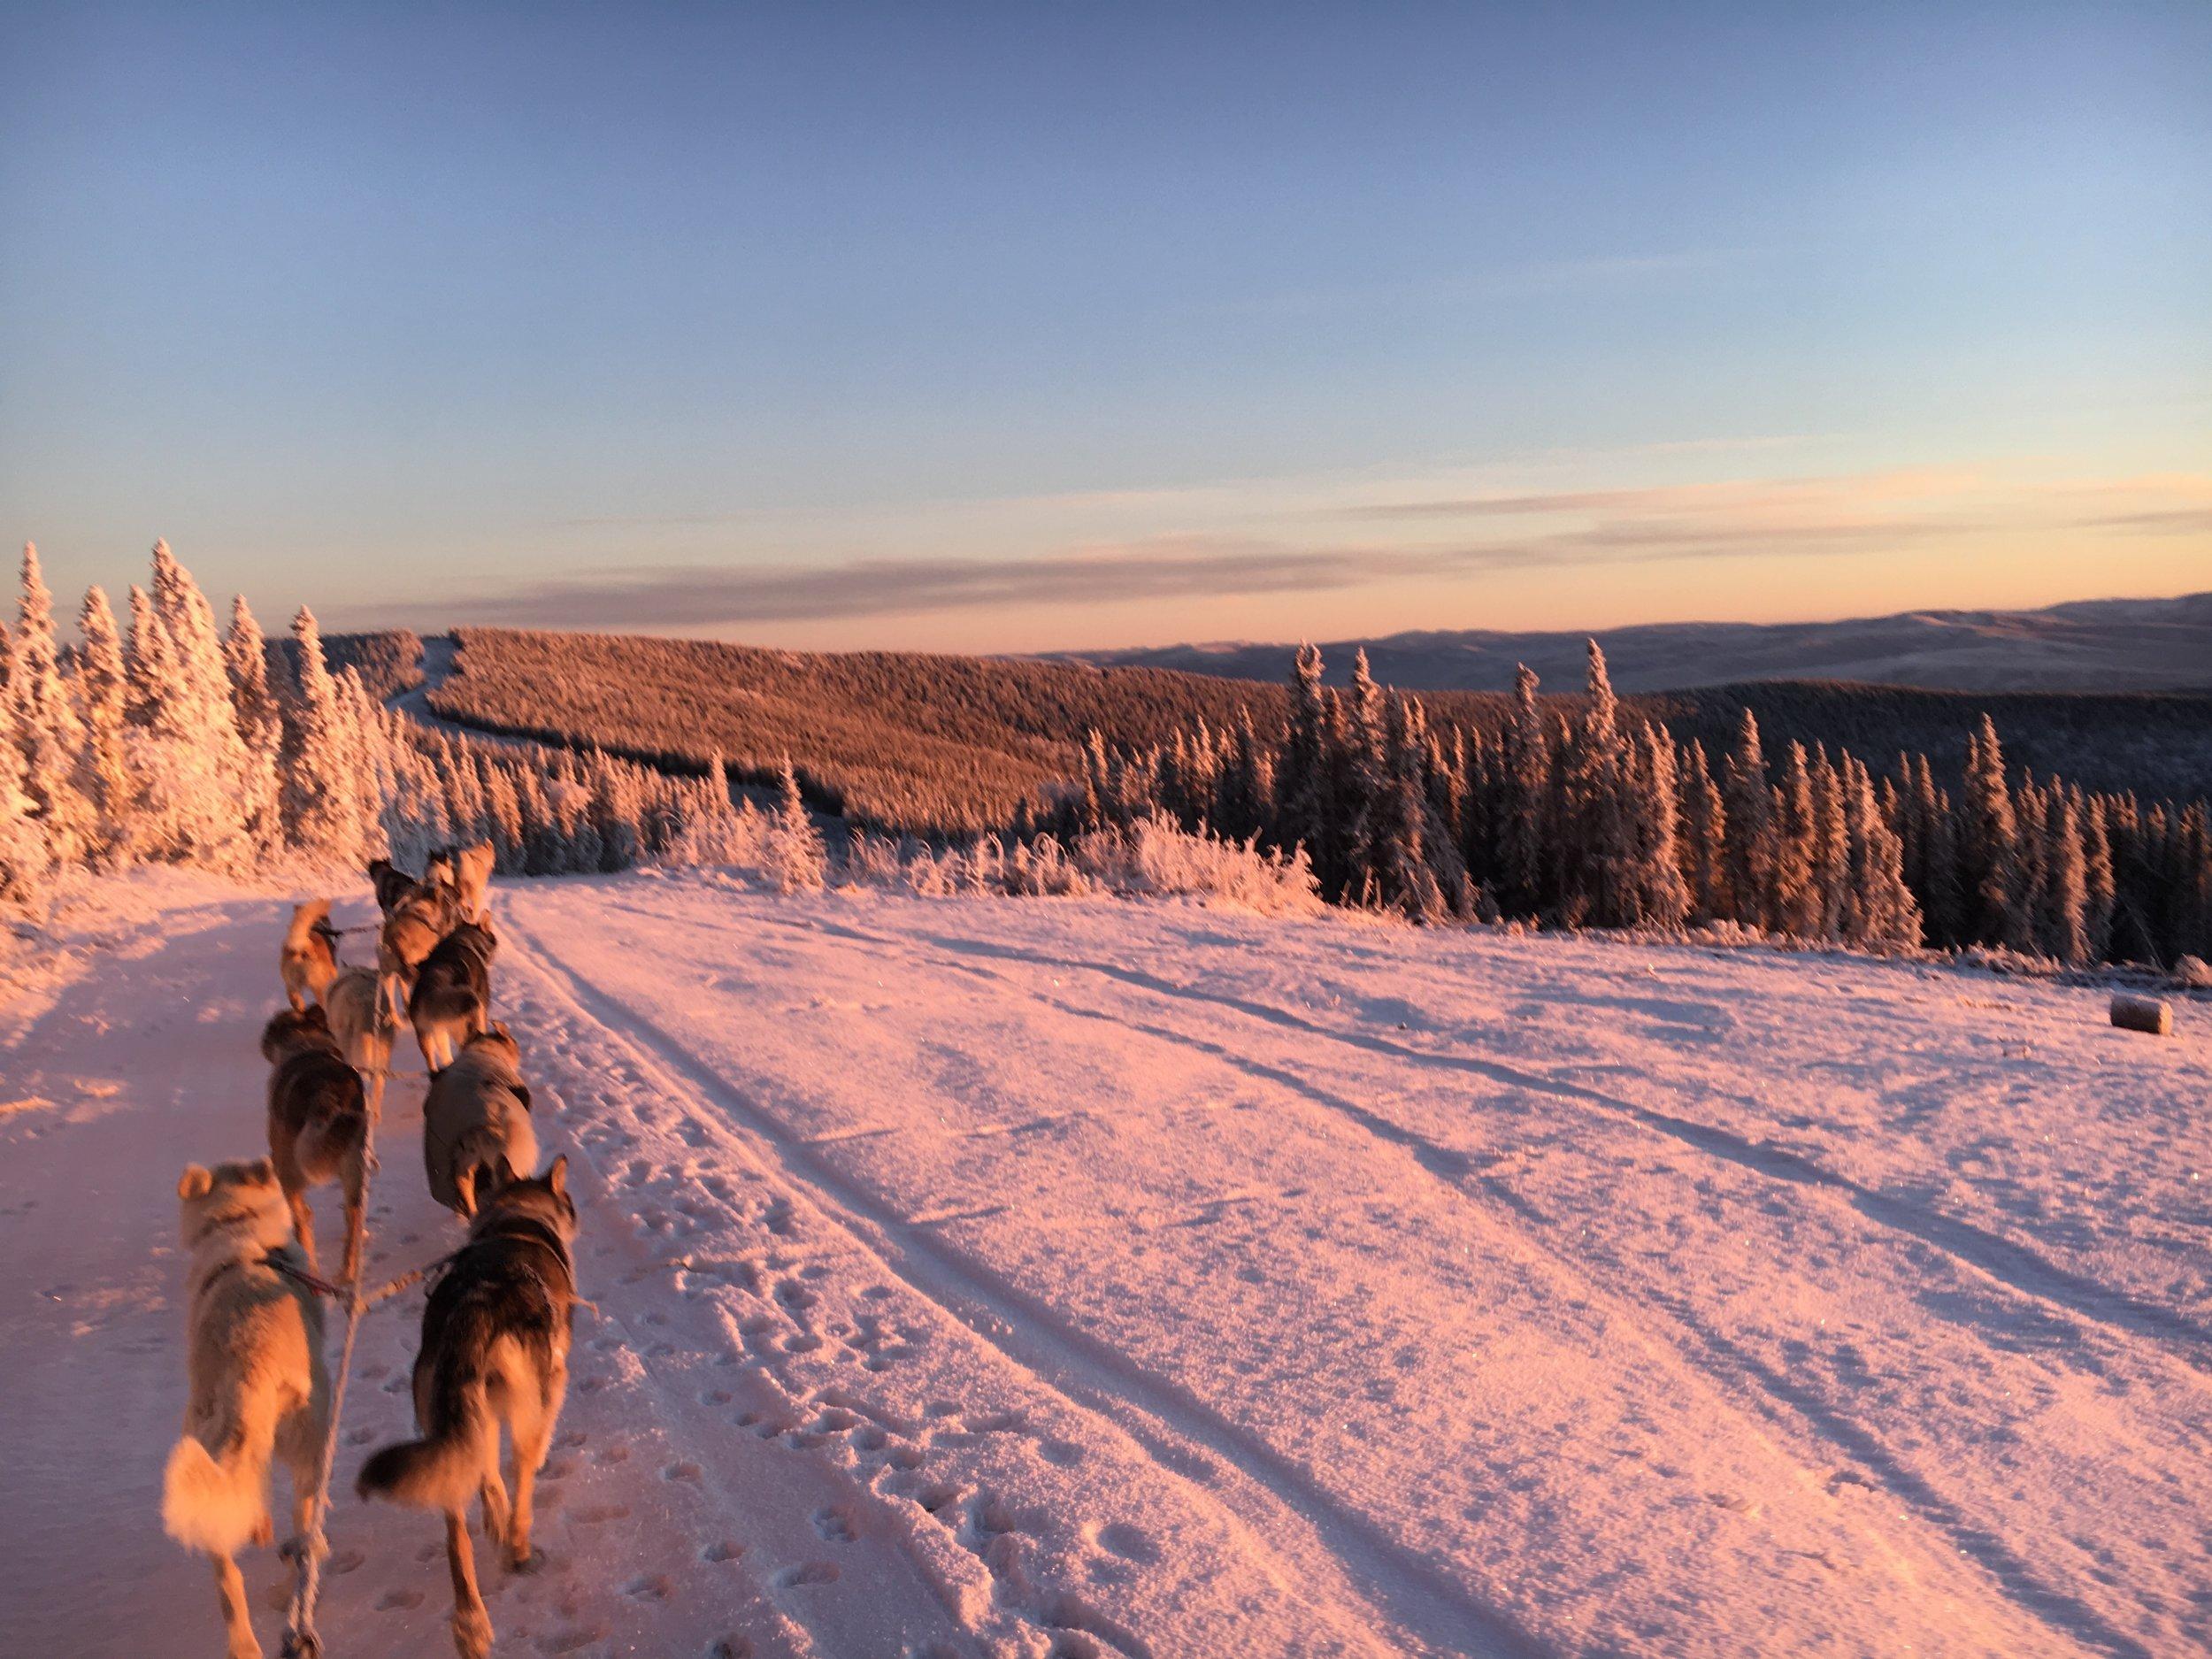 The team basking in the alpine glow of 3:15 PM in Alaska.